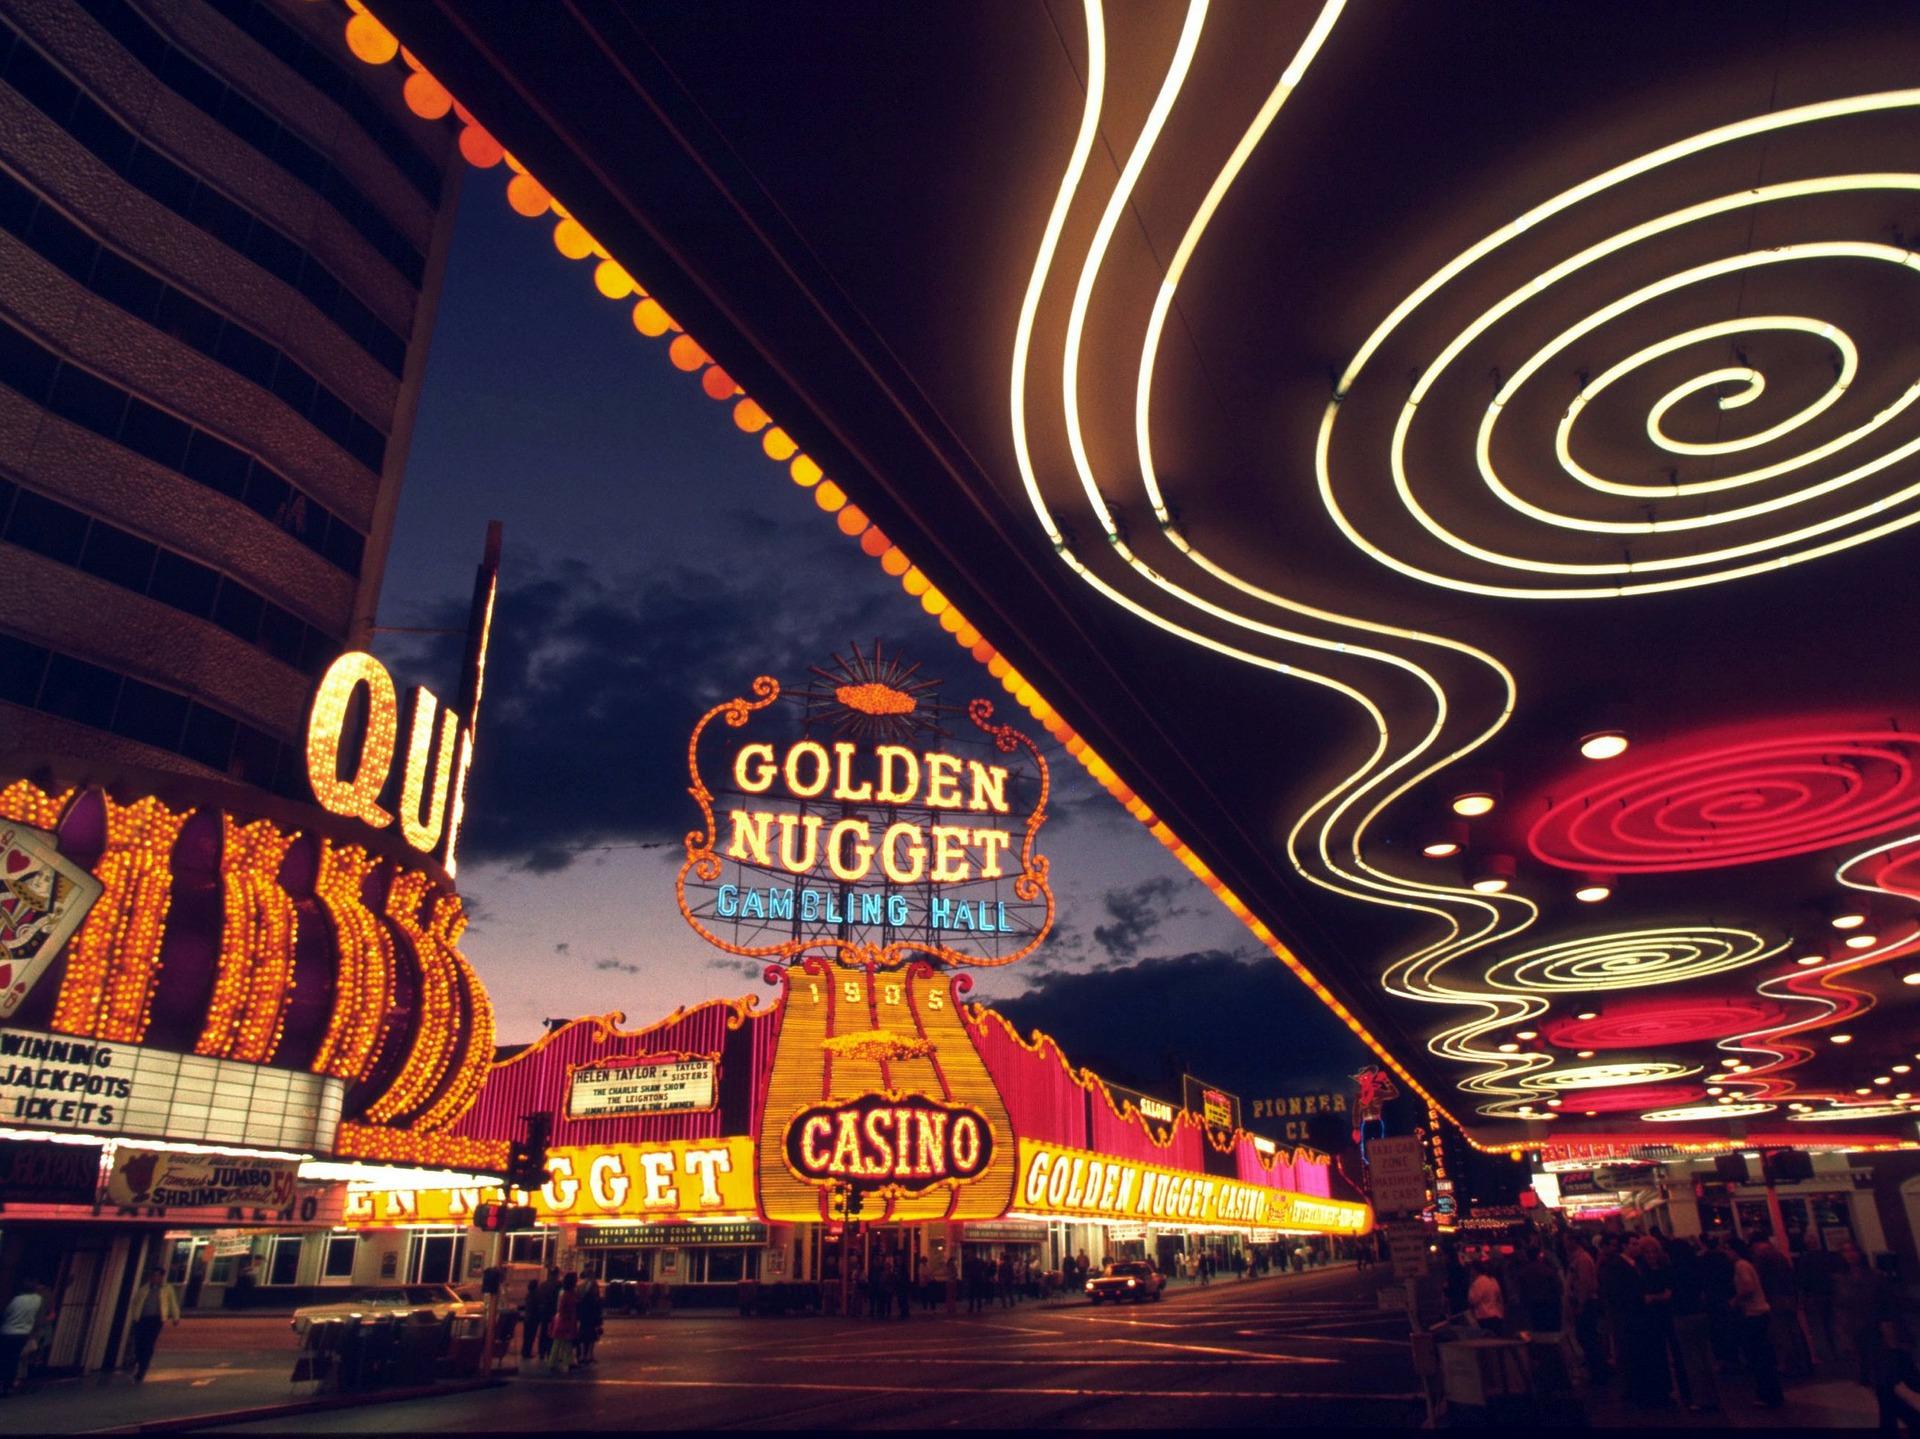 Open Poker Rooms in Vegas